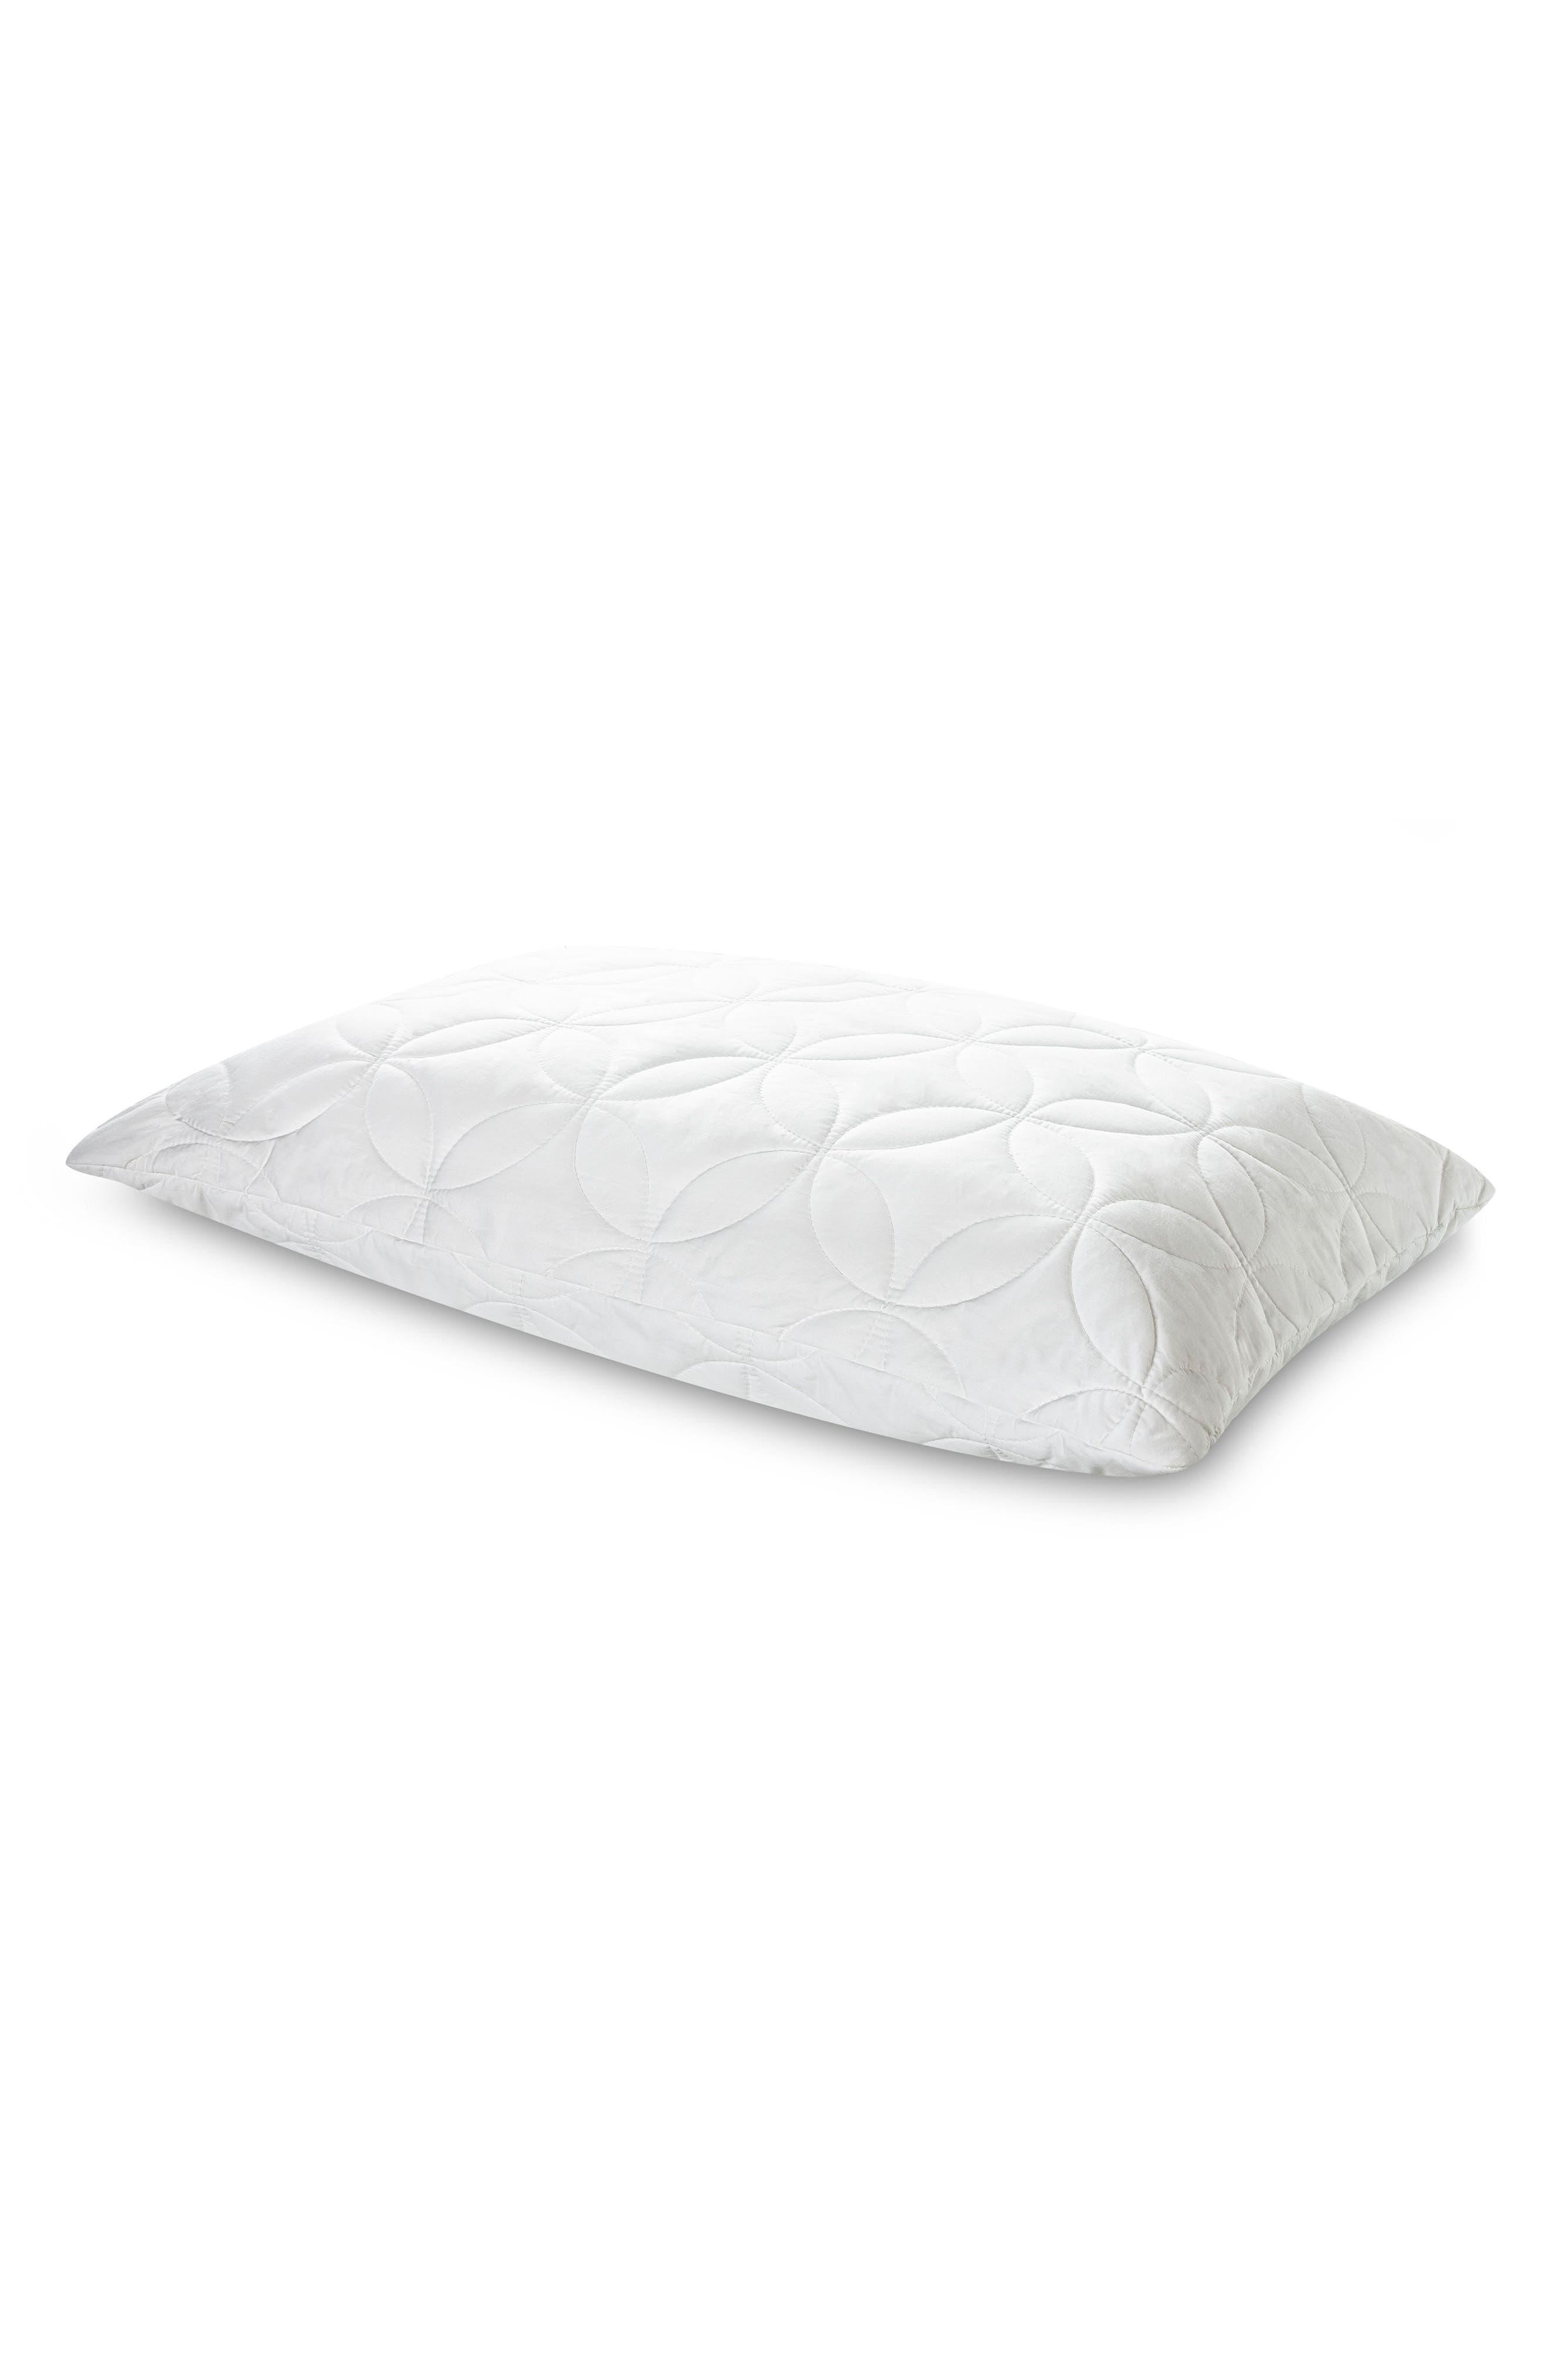 Alternate Image 1 Selected - Tempur-Pedic TEMPUR-Cloud Soft & Conforming Queen Pillow